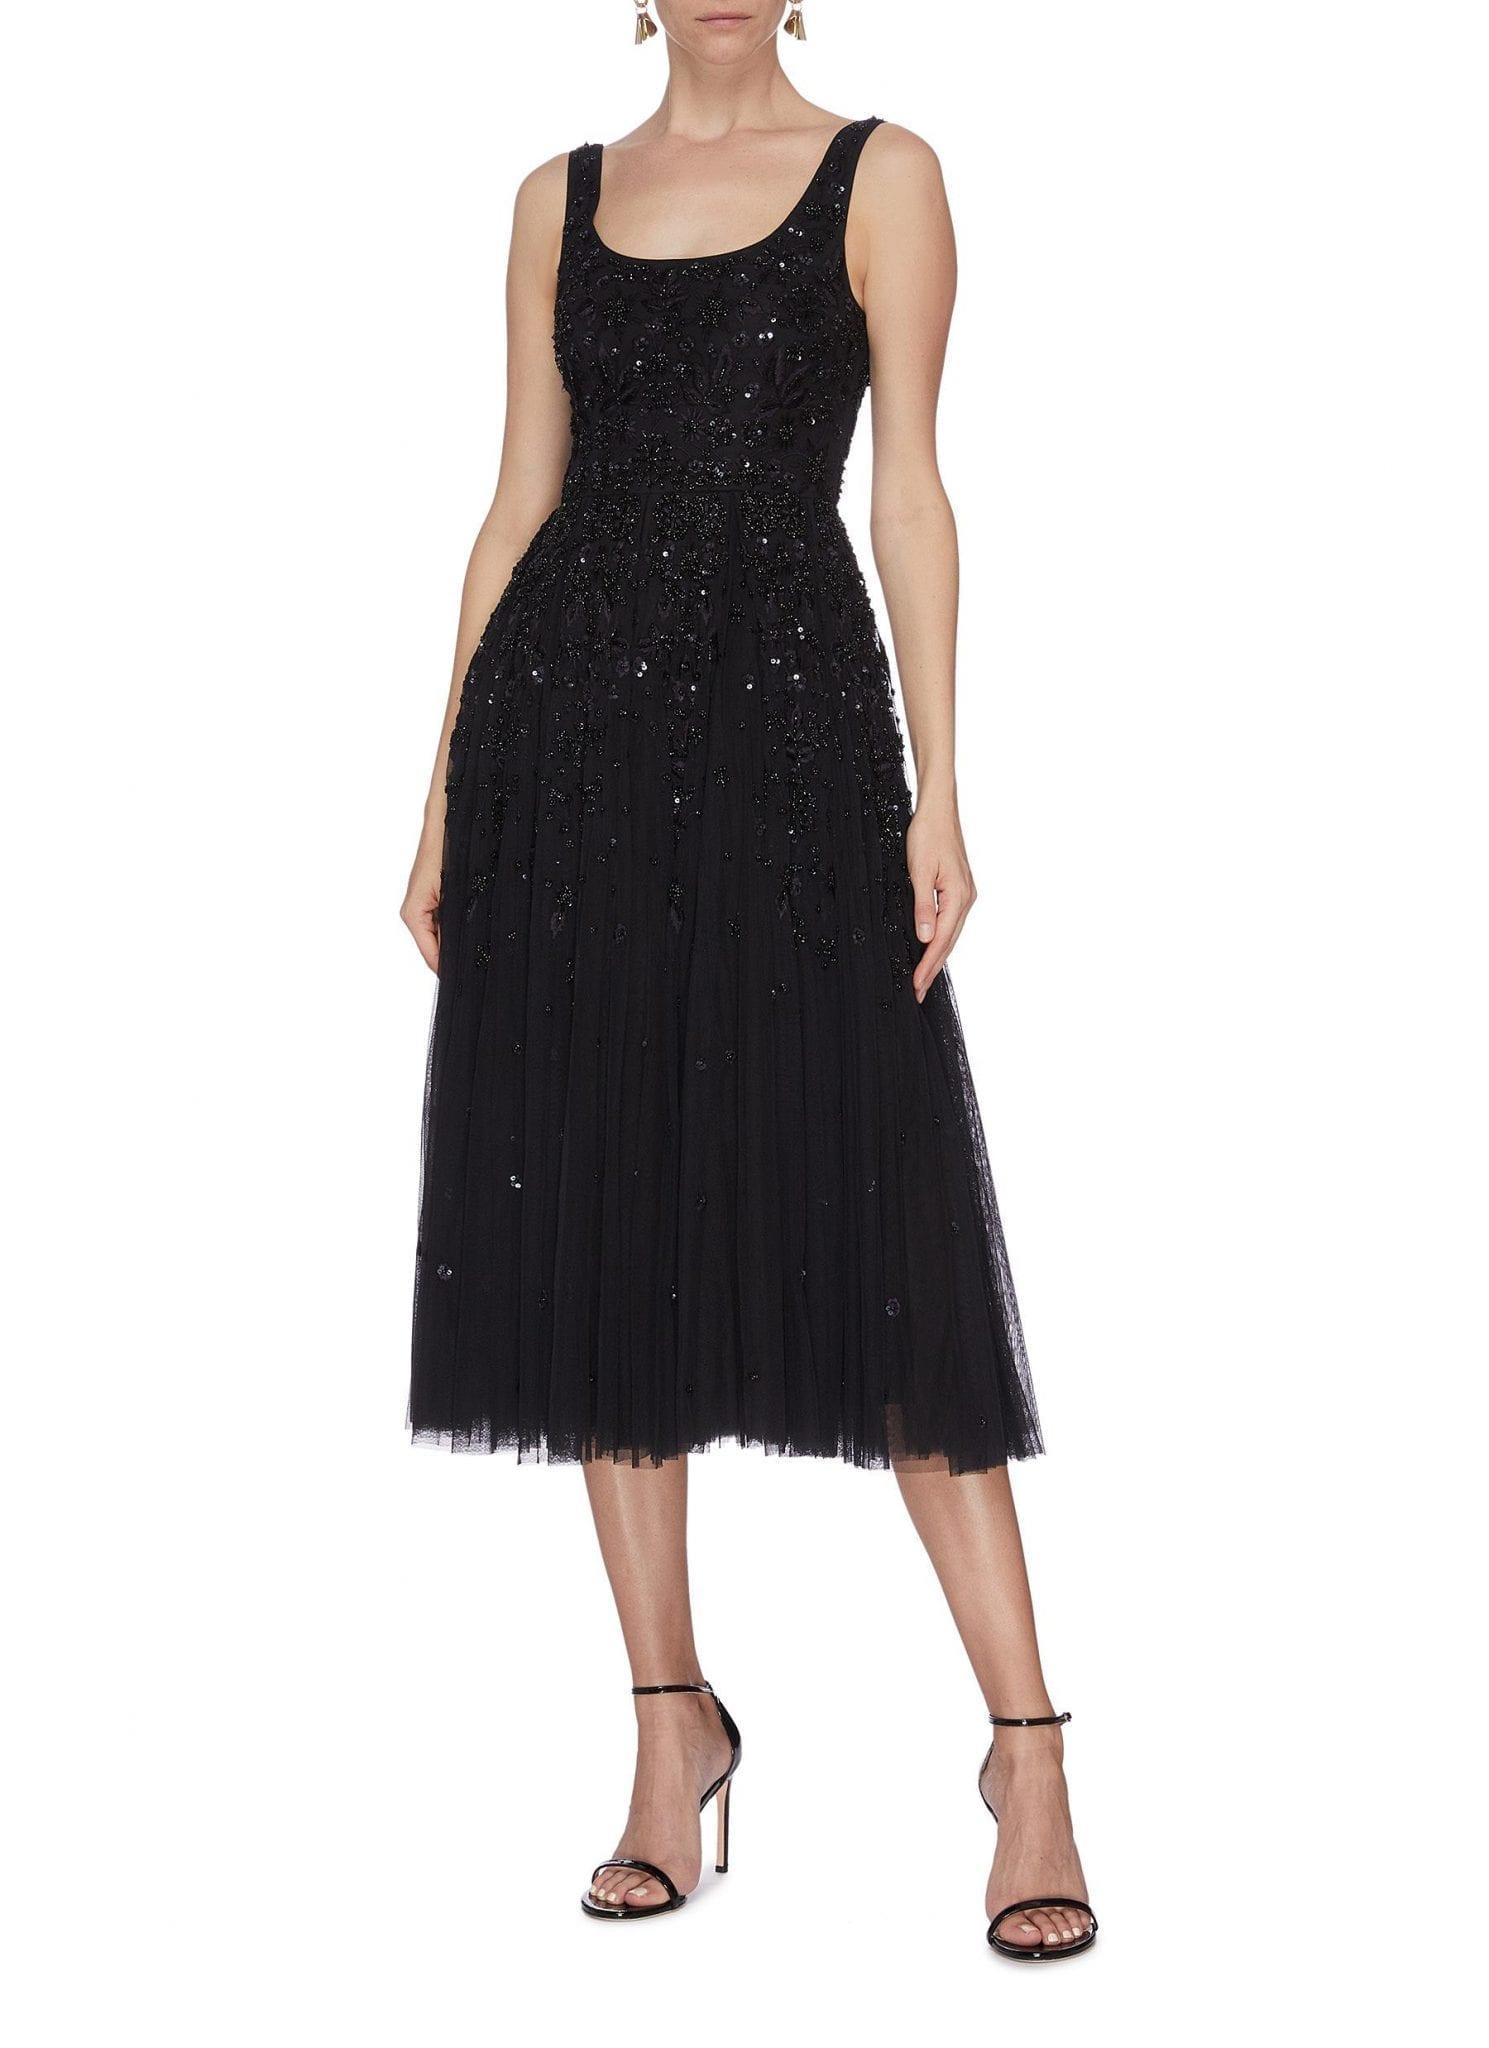 NEEDLE & THREAD 'Snowflake' Sequin Embellished Prom Dress